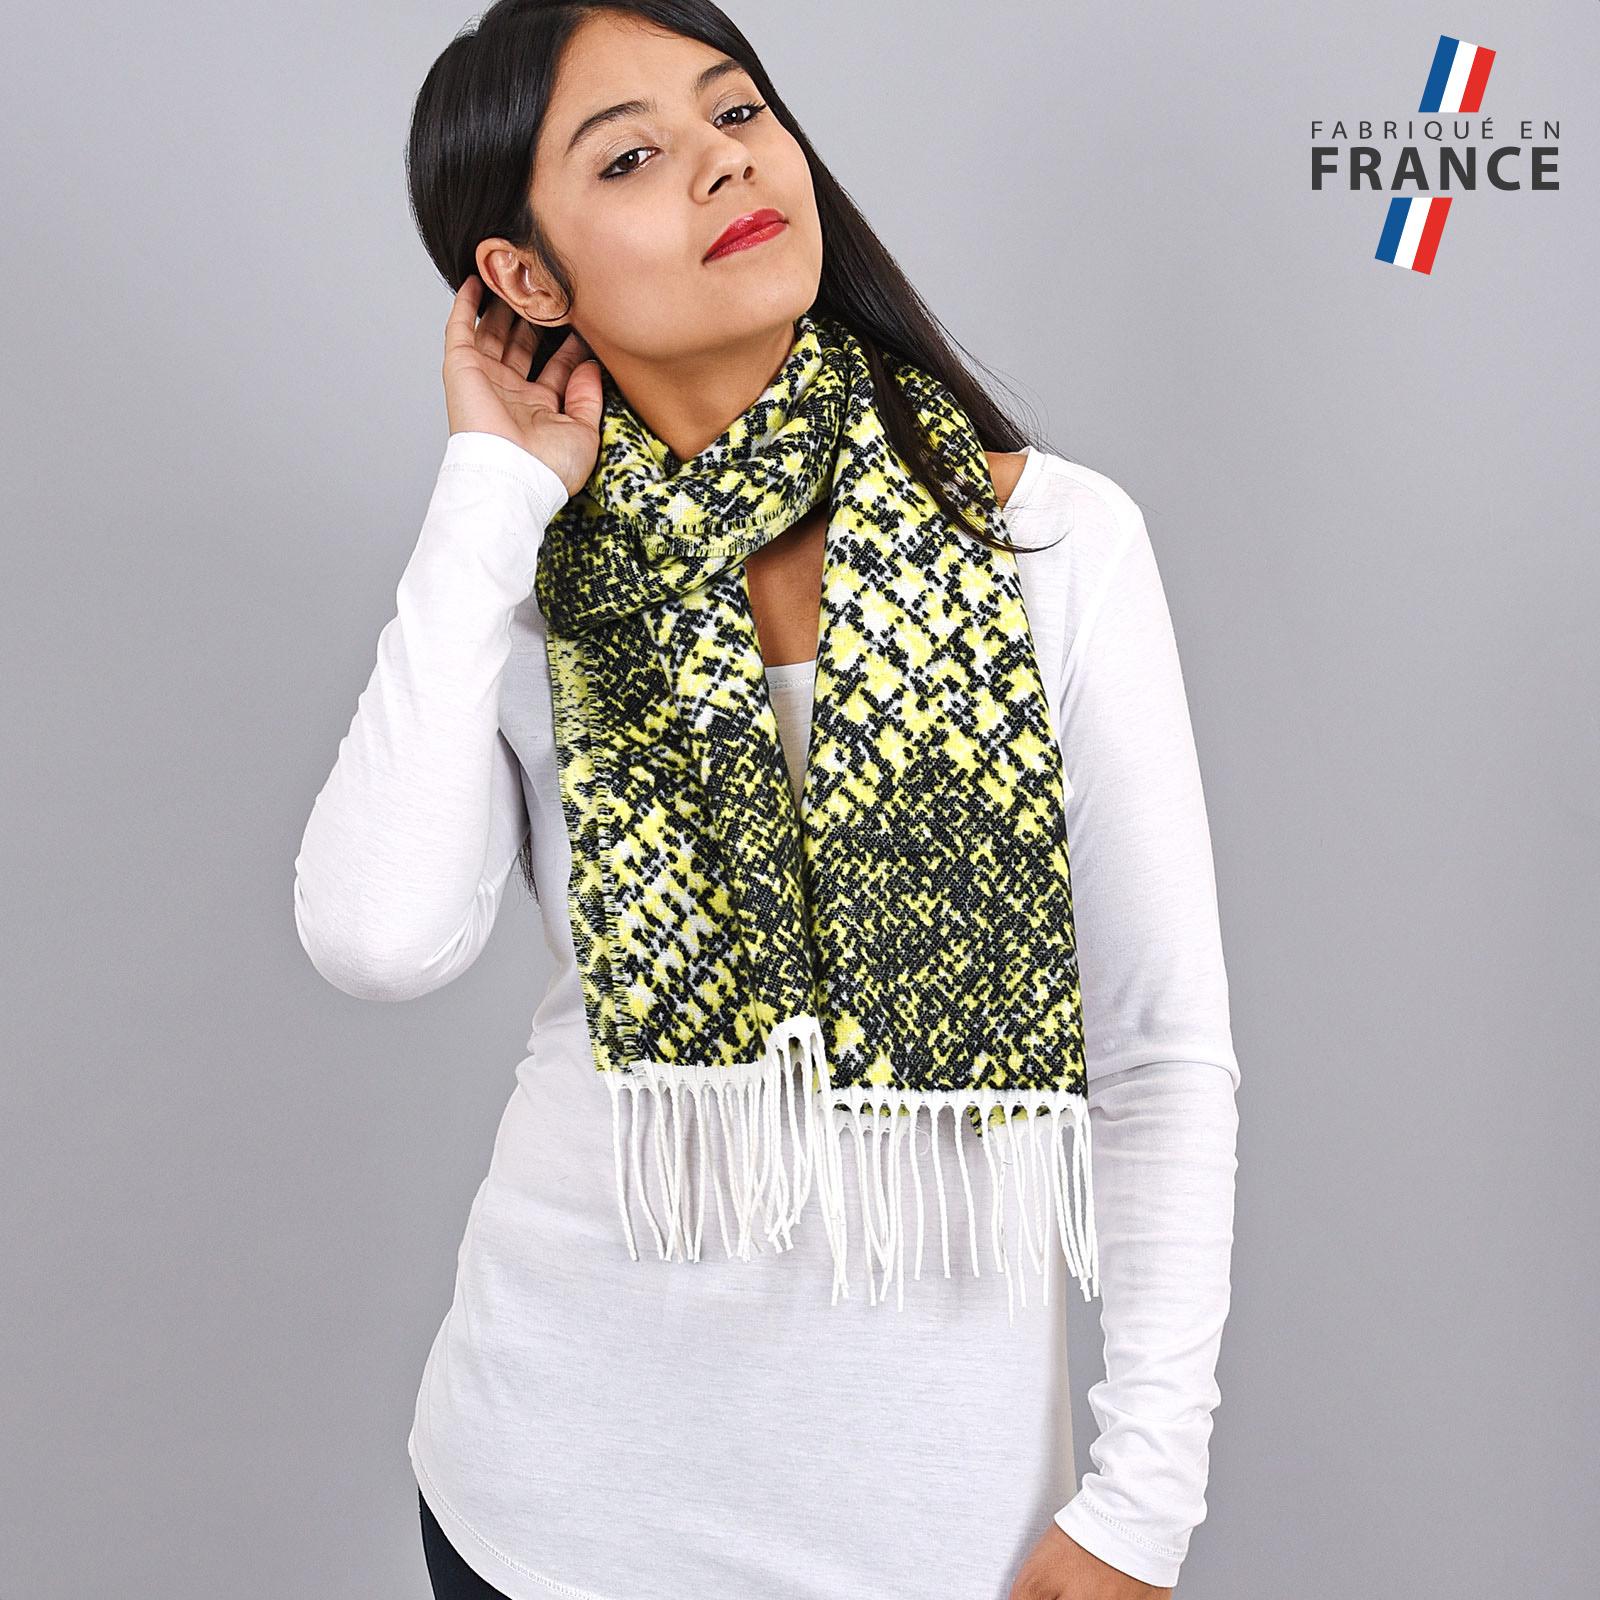 AT-03943-VF16-FR-echarpe-femme-verte-graphique